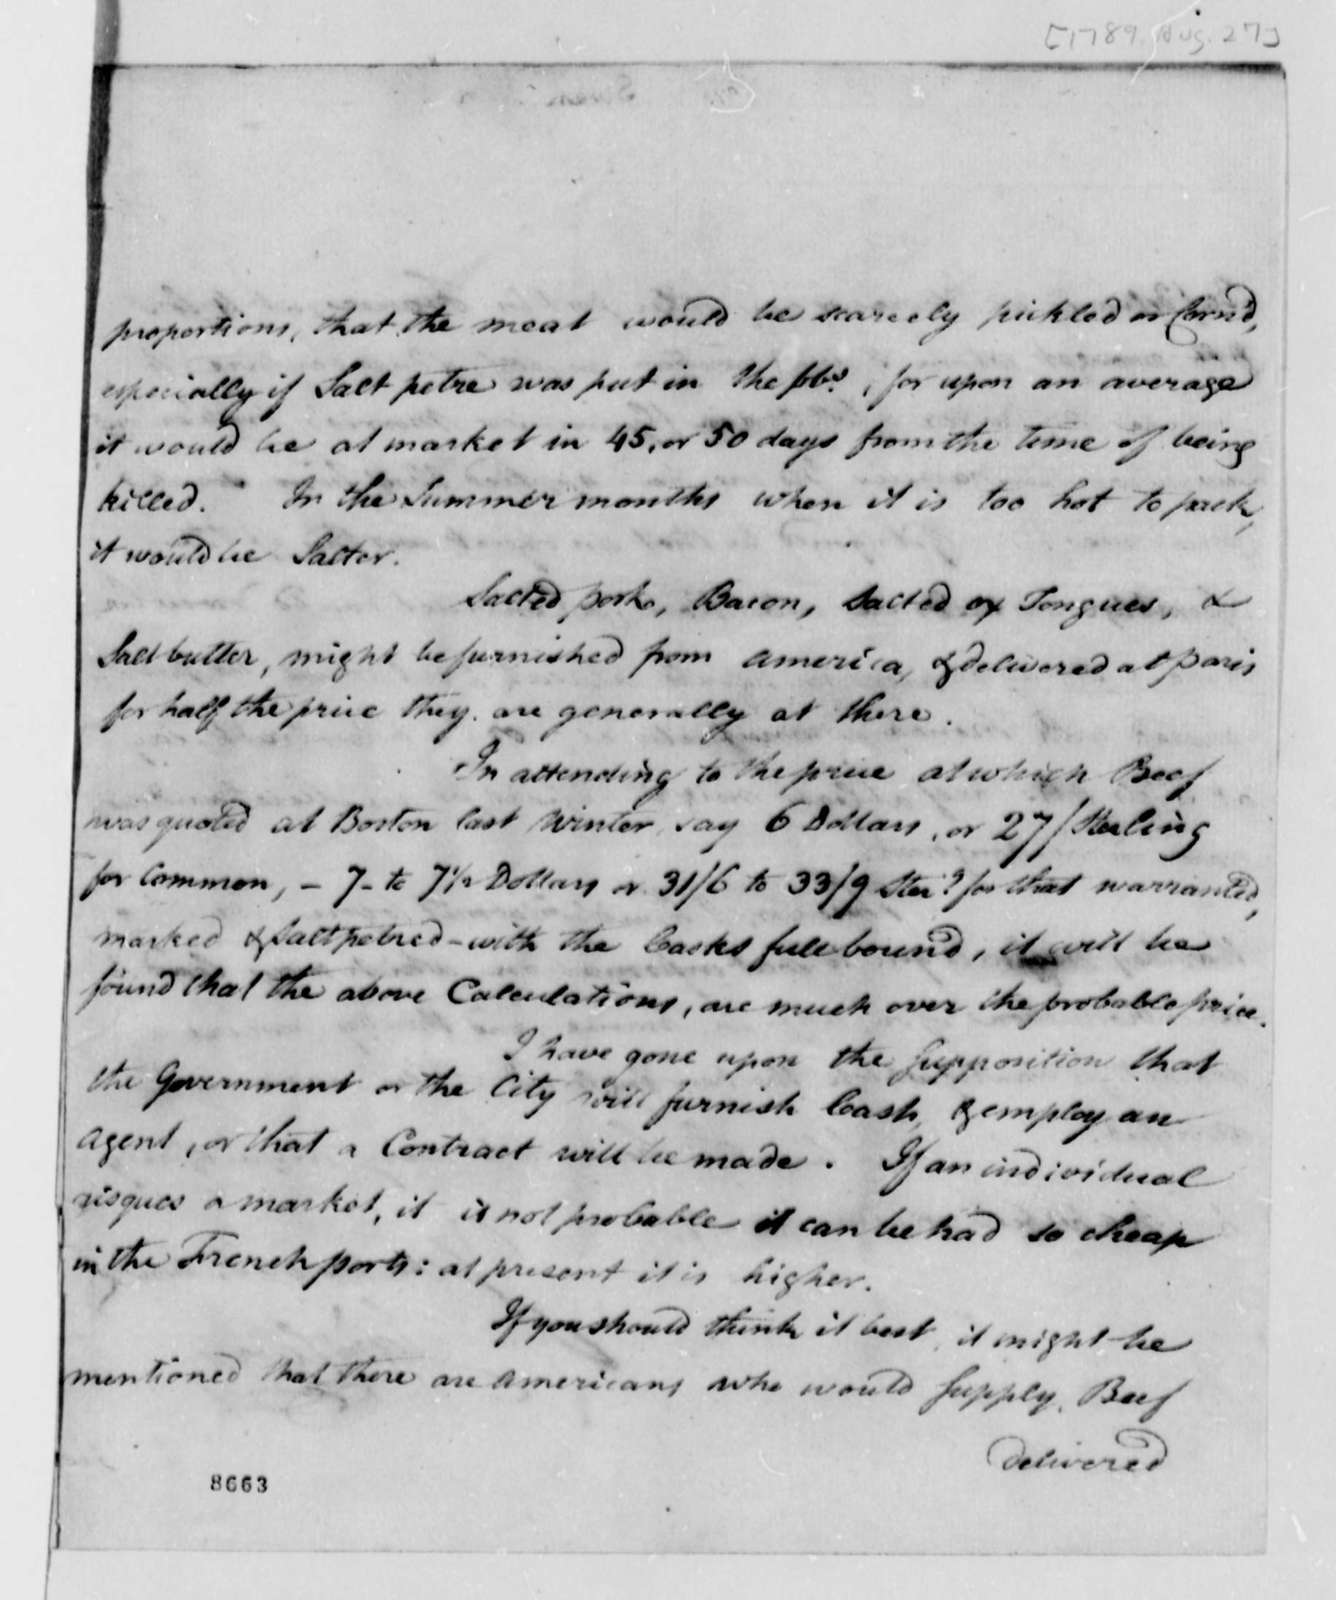 James Swan to Thomas Jefferson, August 27, 1789